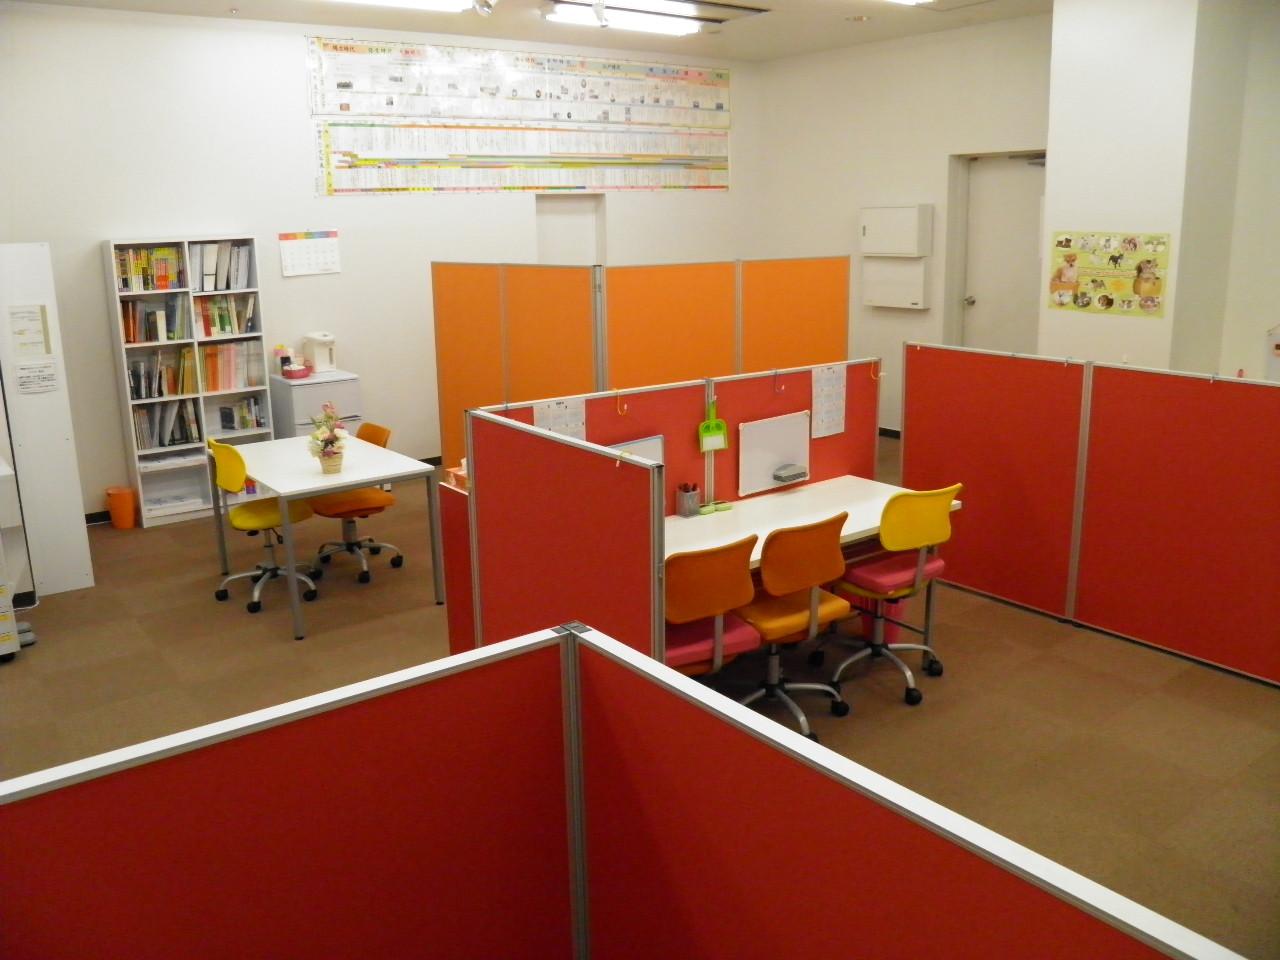 YOKOHAMA I SCHOOL(ヨコハマアイスクール)  ベイタウン本牧 のアルバイト情報